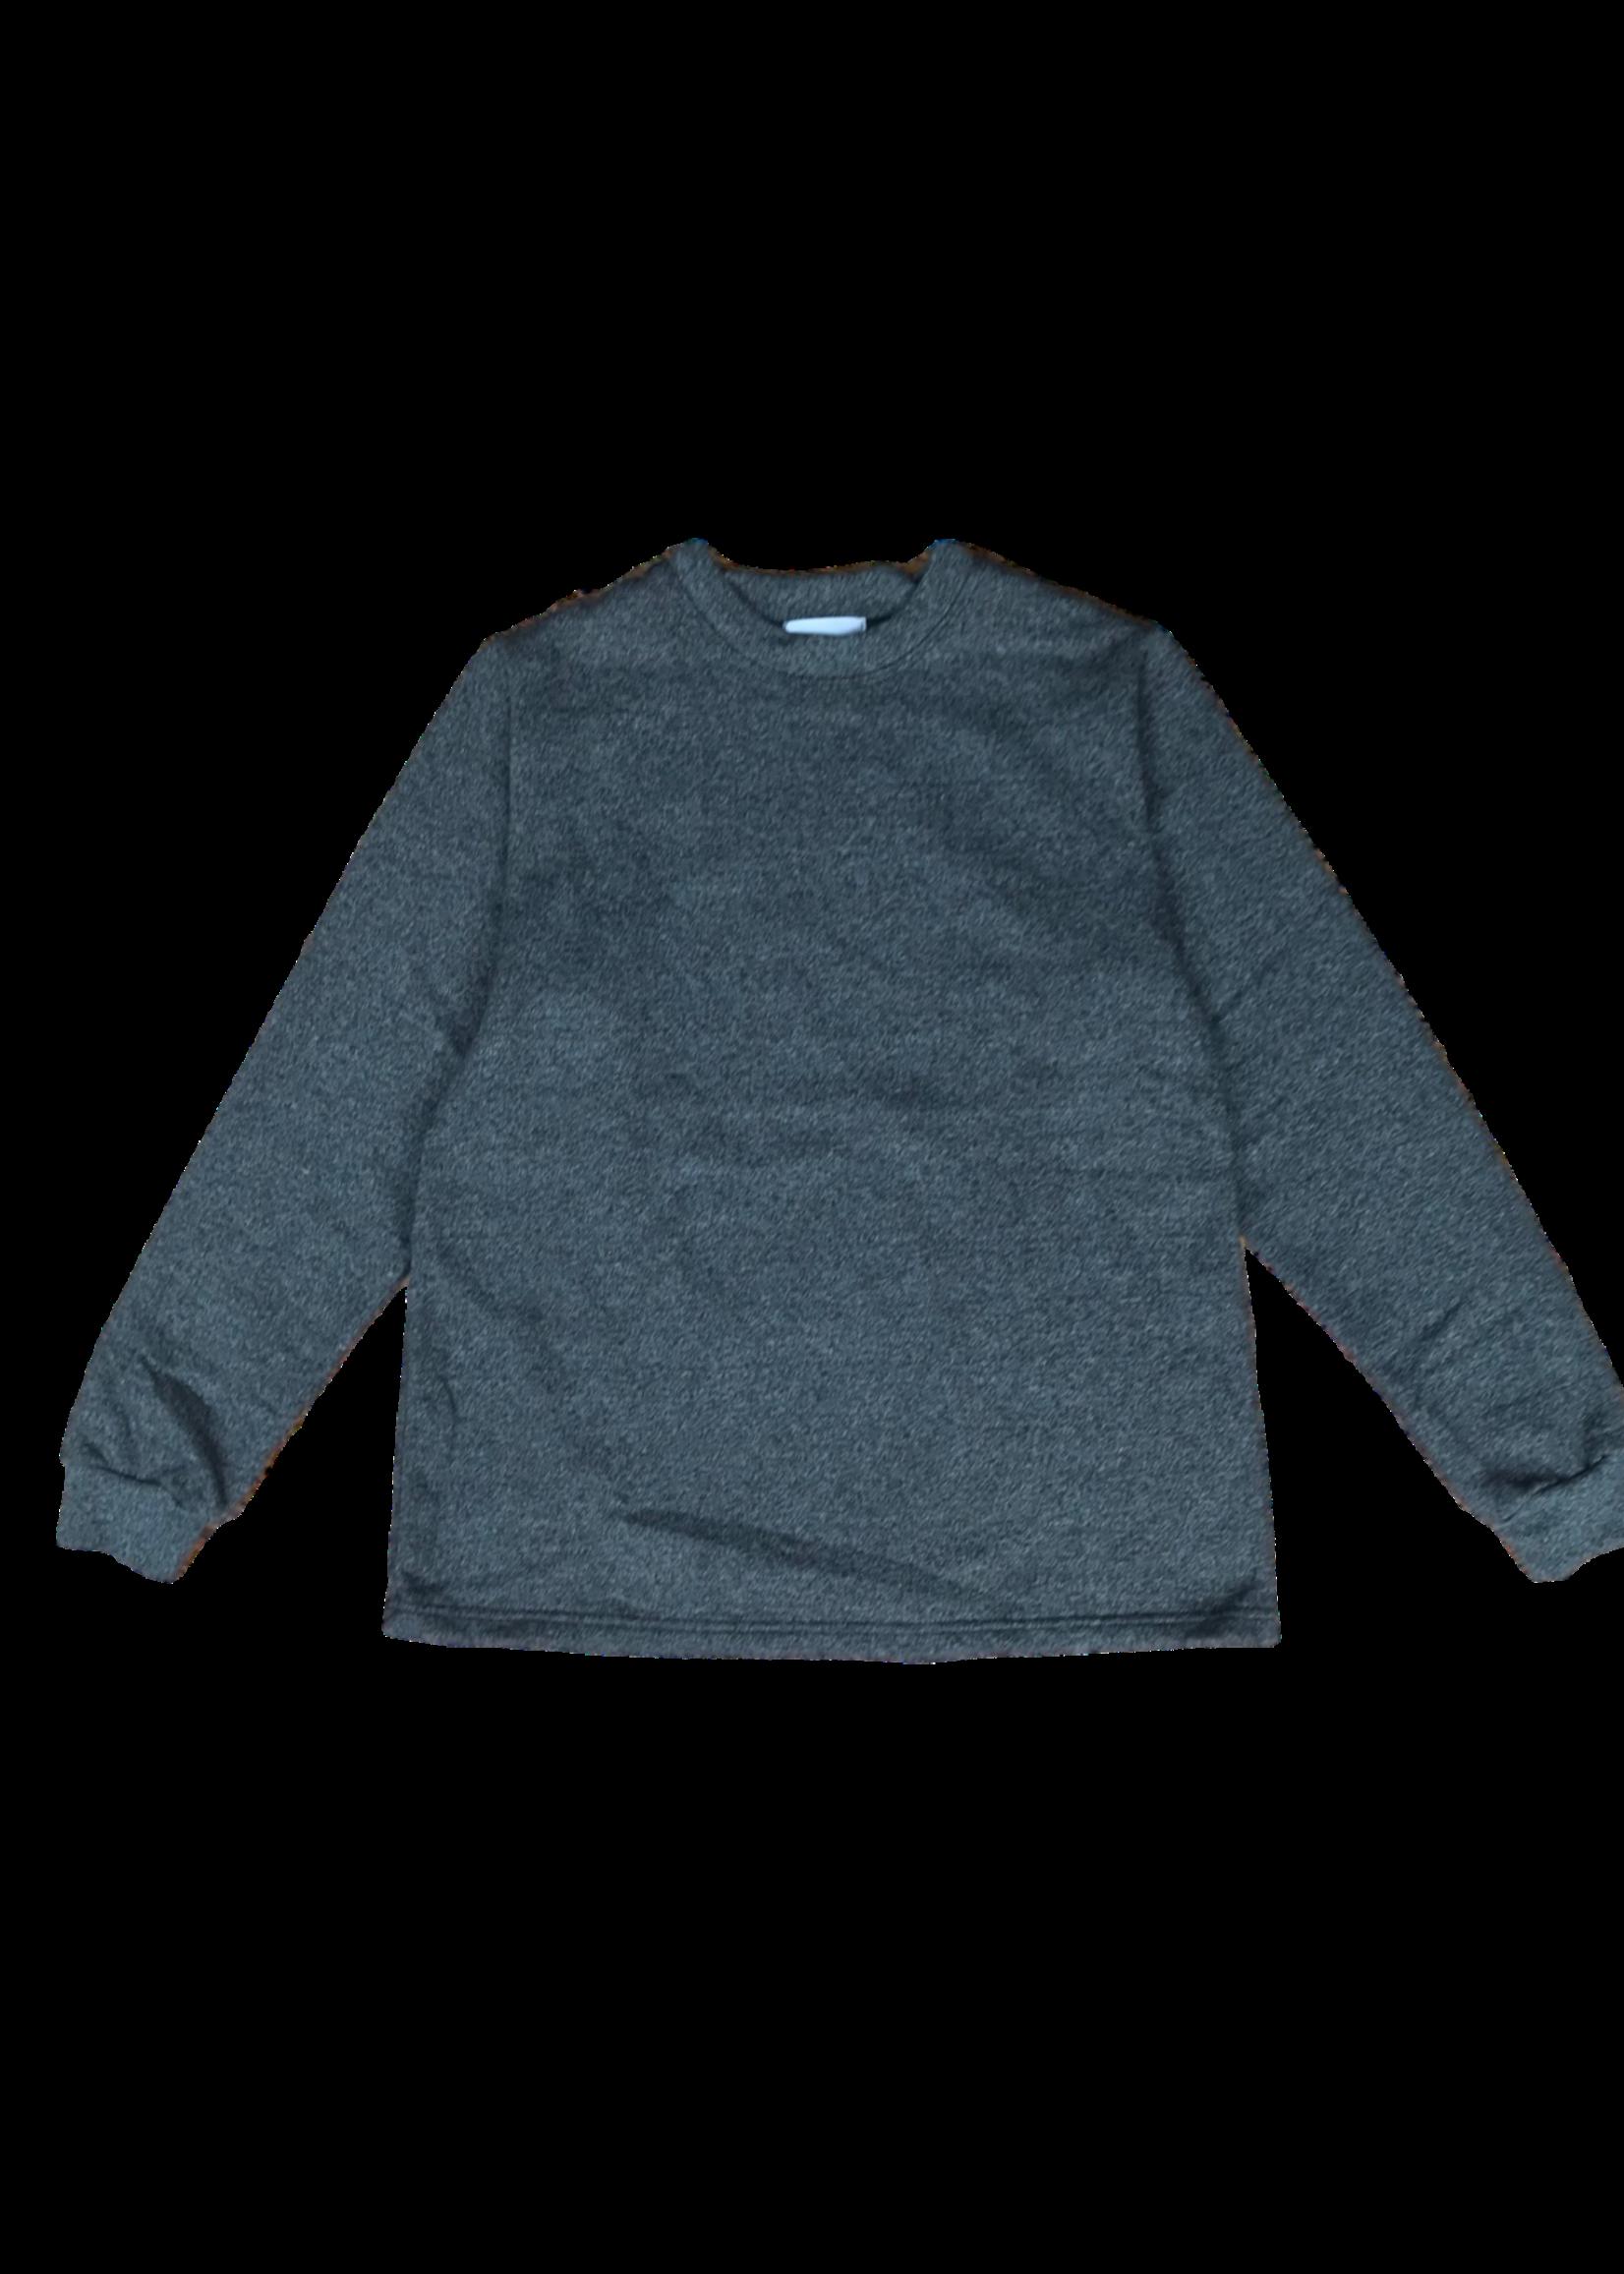 A.C.C Crew Neck Sweatshirt, Charcoal